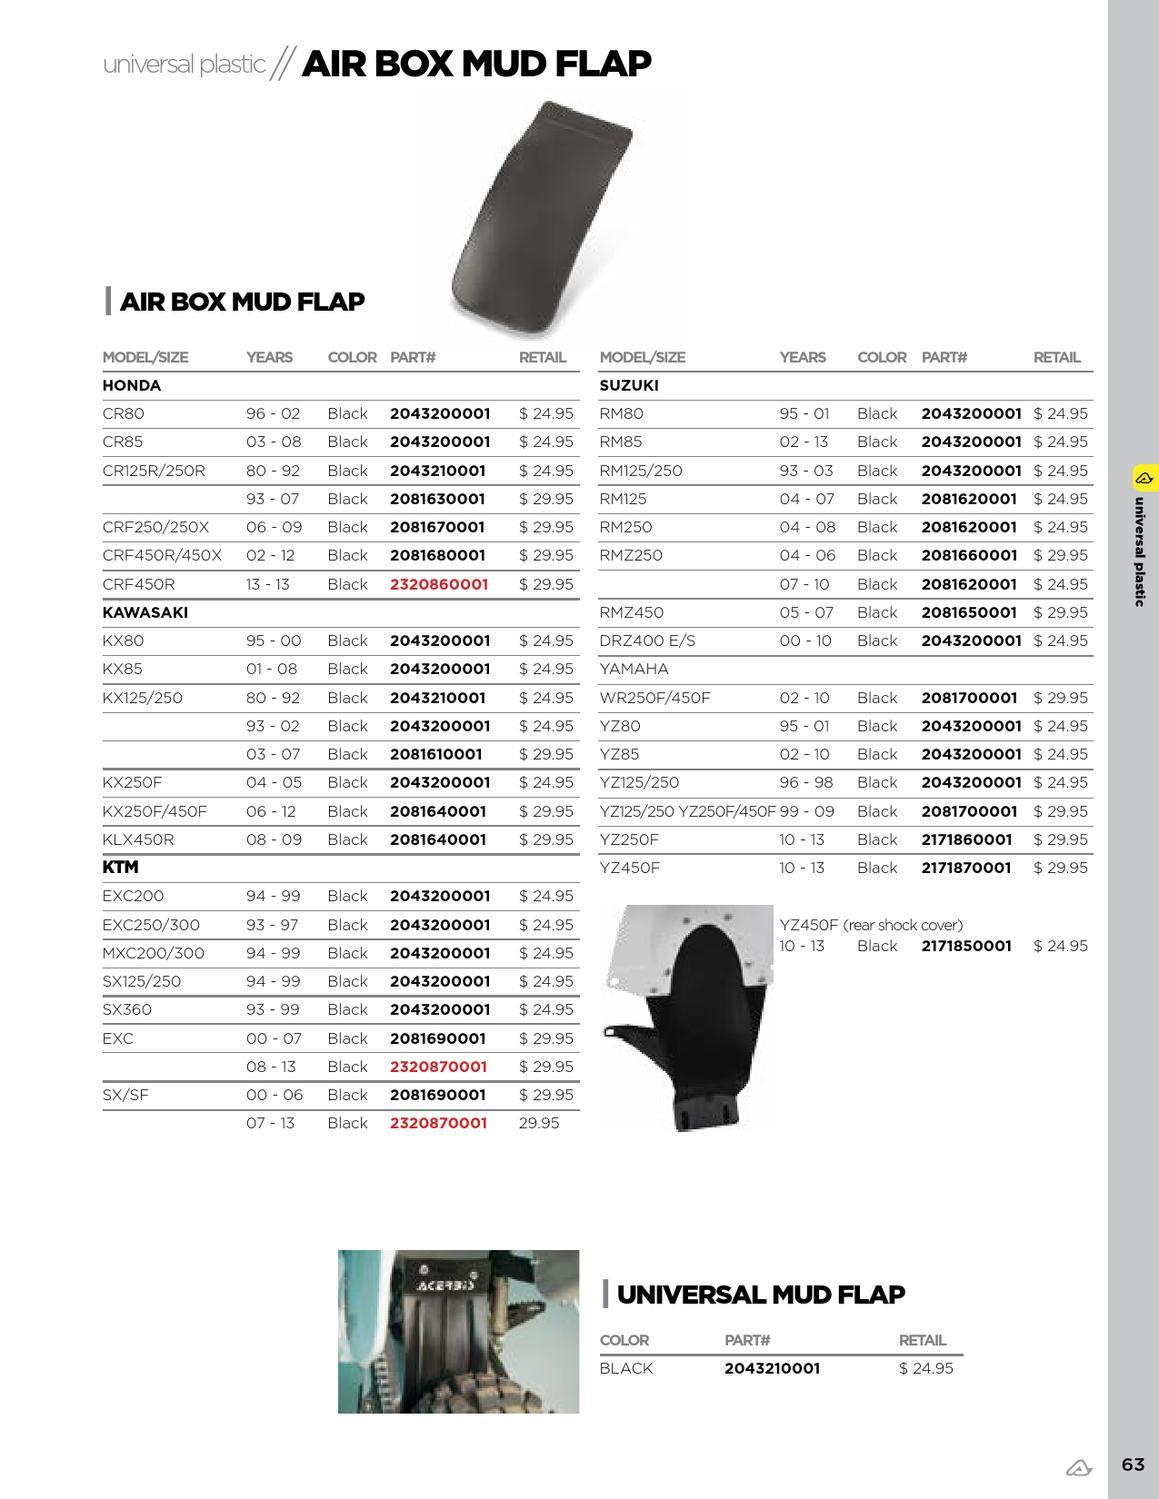 Airbox Mud Flap Acerbis Black 2081680001